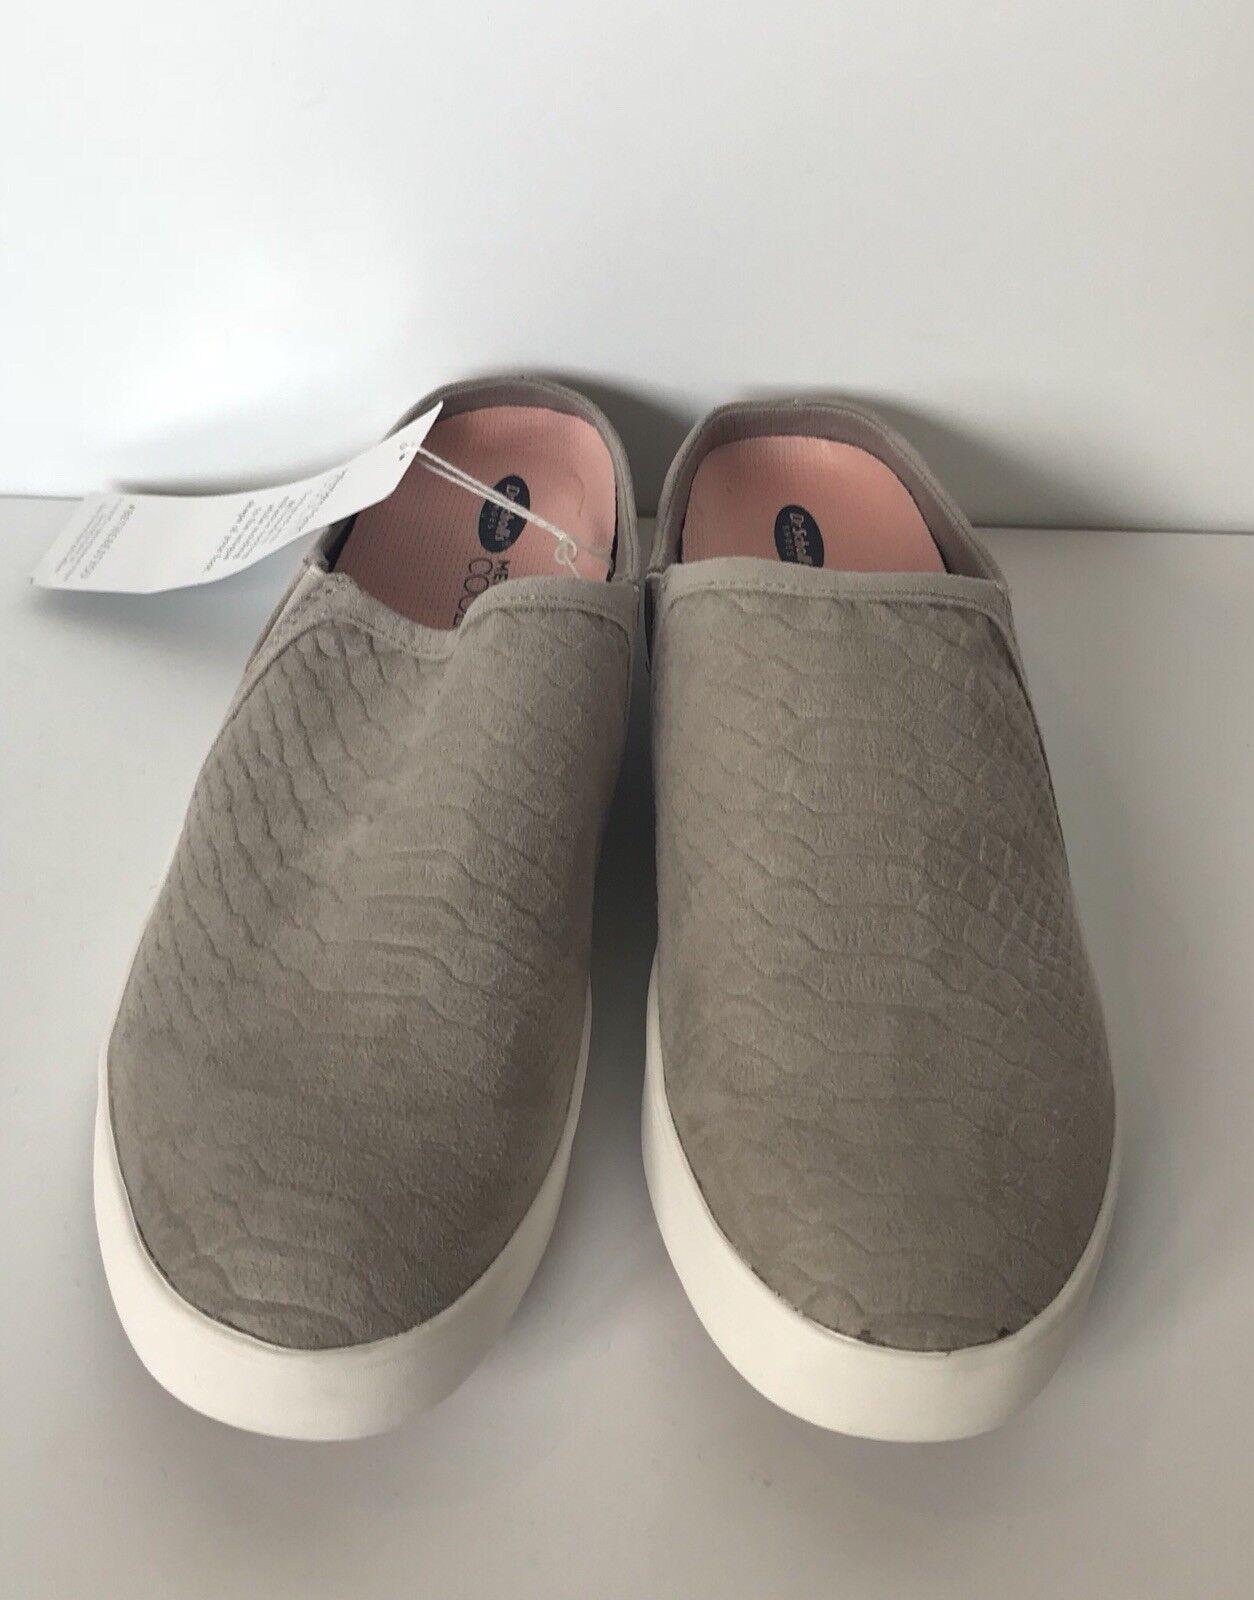 Dr. Slip Scholl's Womens Madi Mule Slip Dr. On Fashion Sneaker Grey Gray Snake Sz 9.5 M 1ccc20